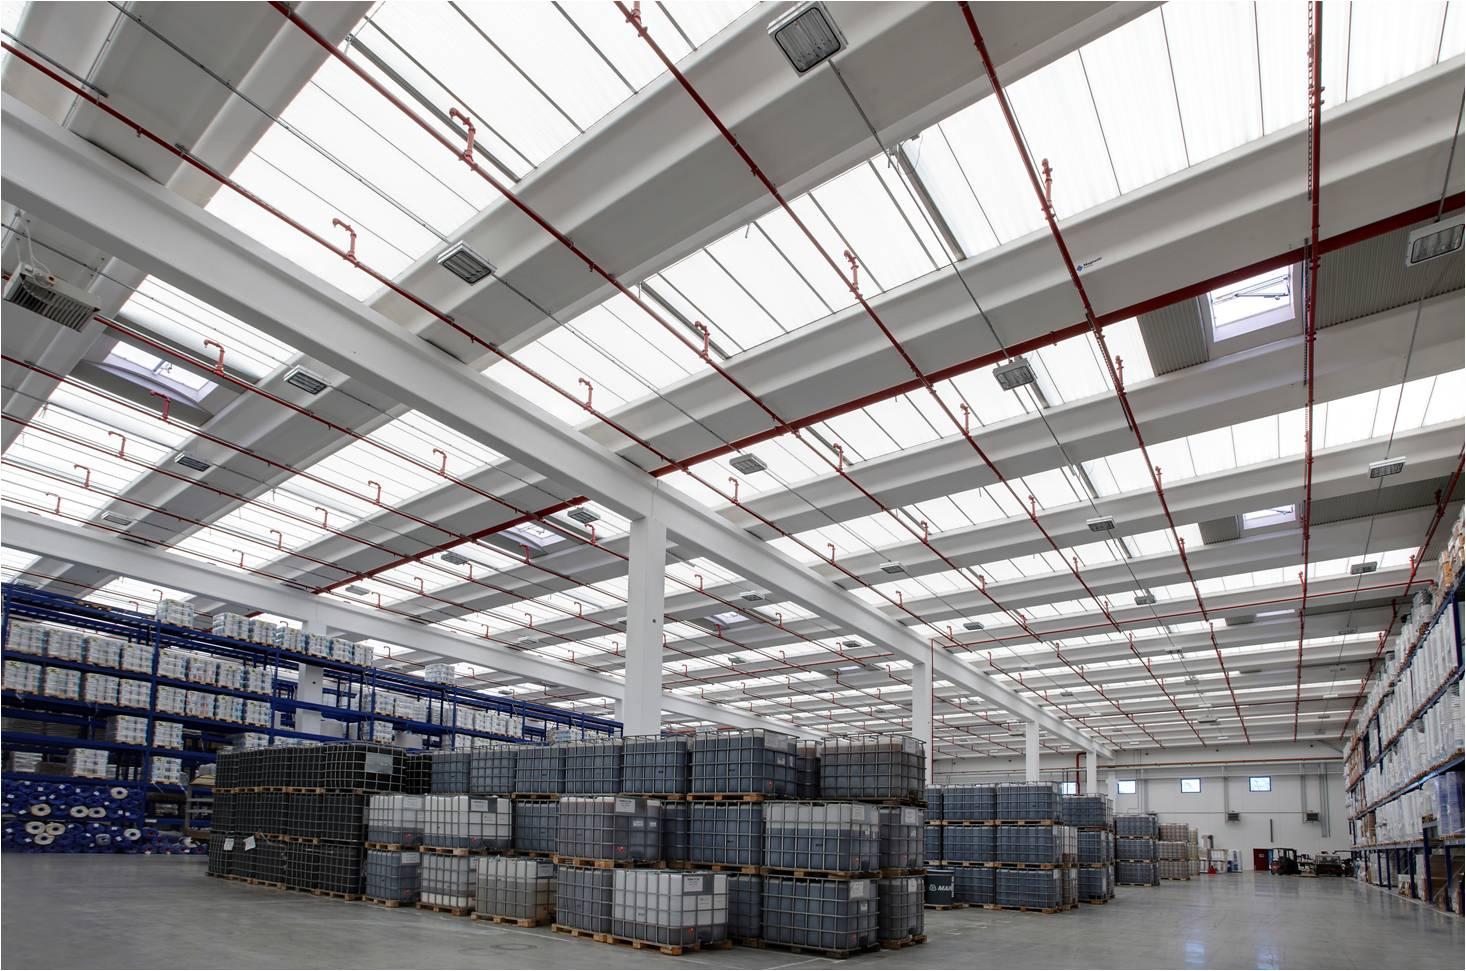 Hale industriale cu elemente structurale prefabricate din beton armat - Sediu Magnetti Building MAGNETTI - Poza 3